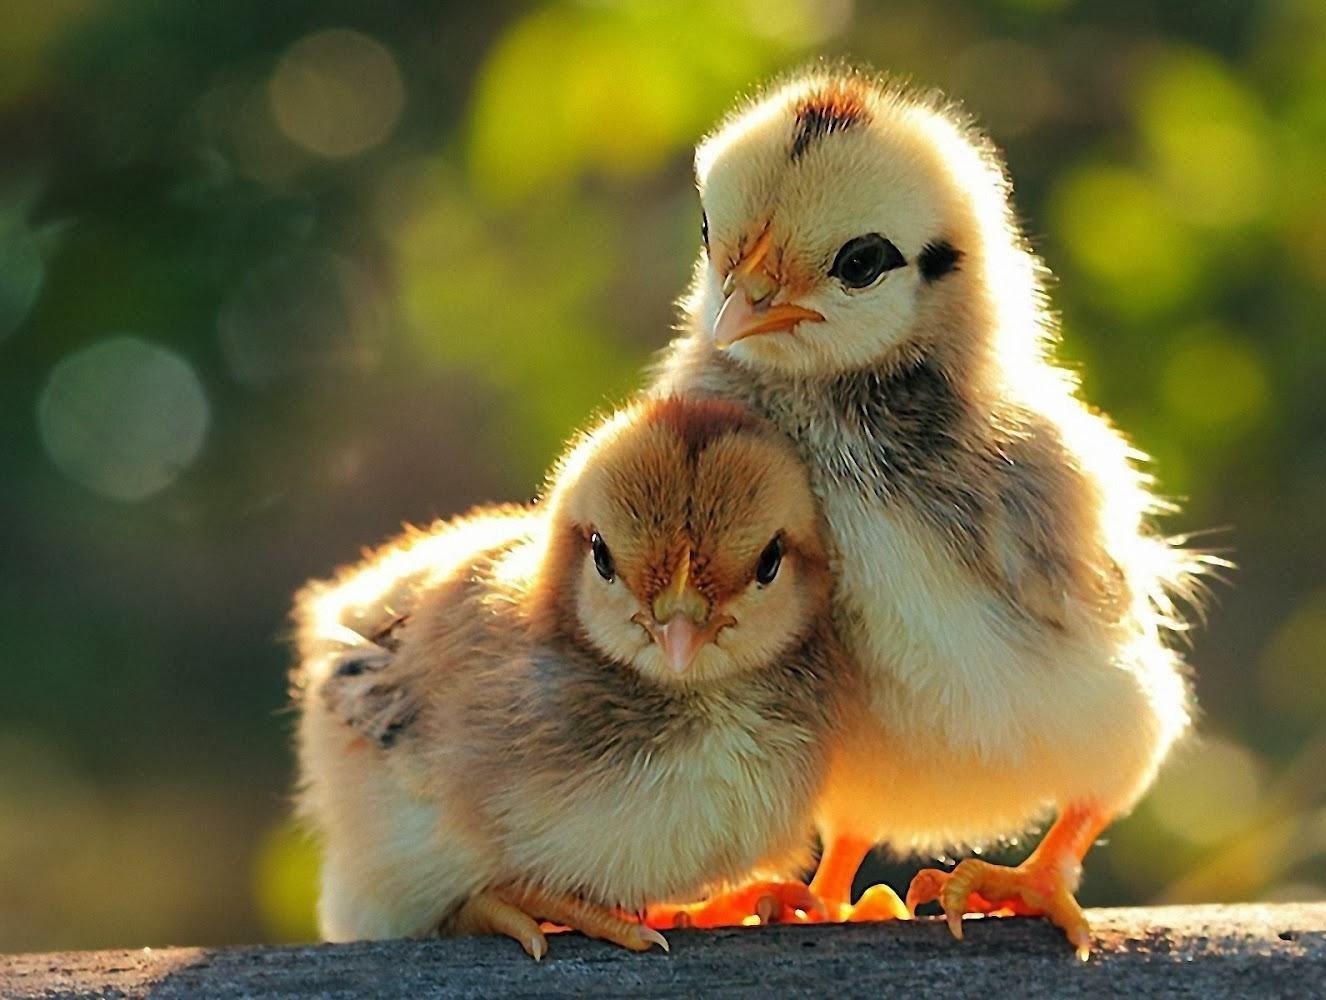 All 4u HD Wallpaper Free Download : Cute Baby Chick ...